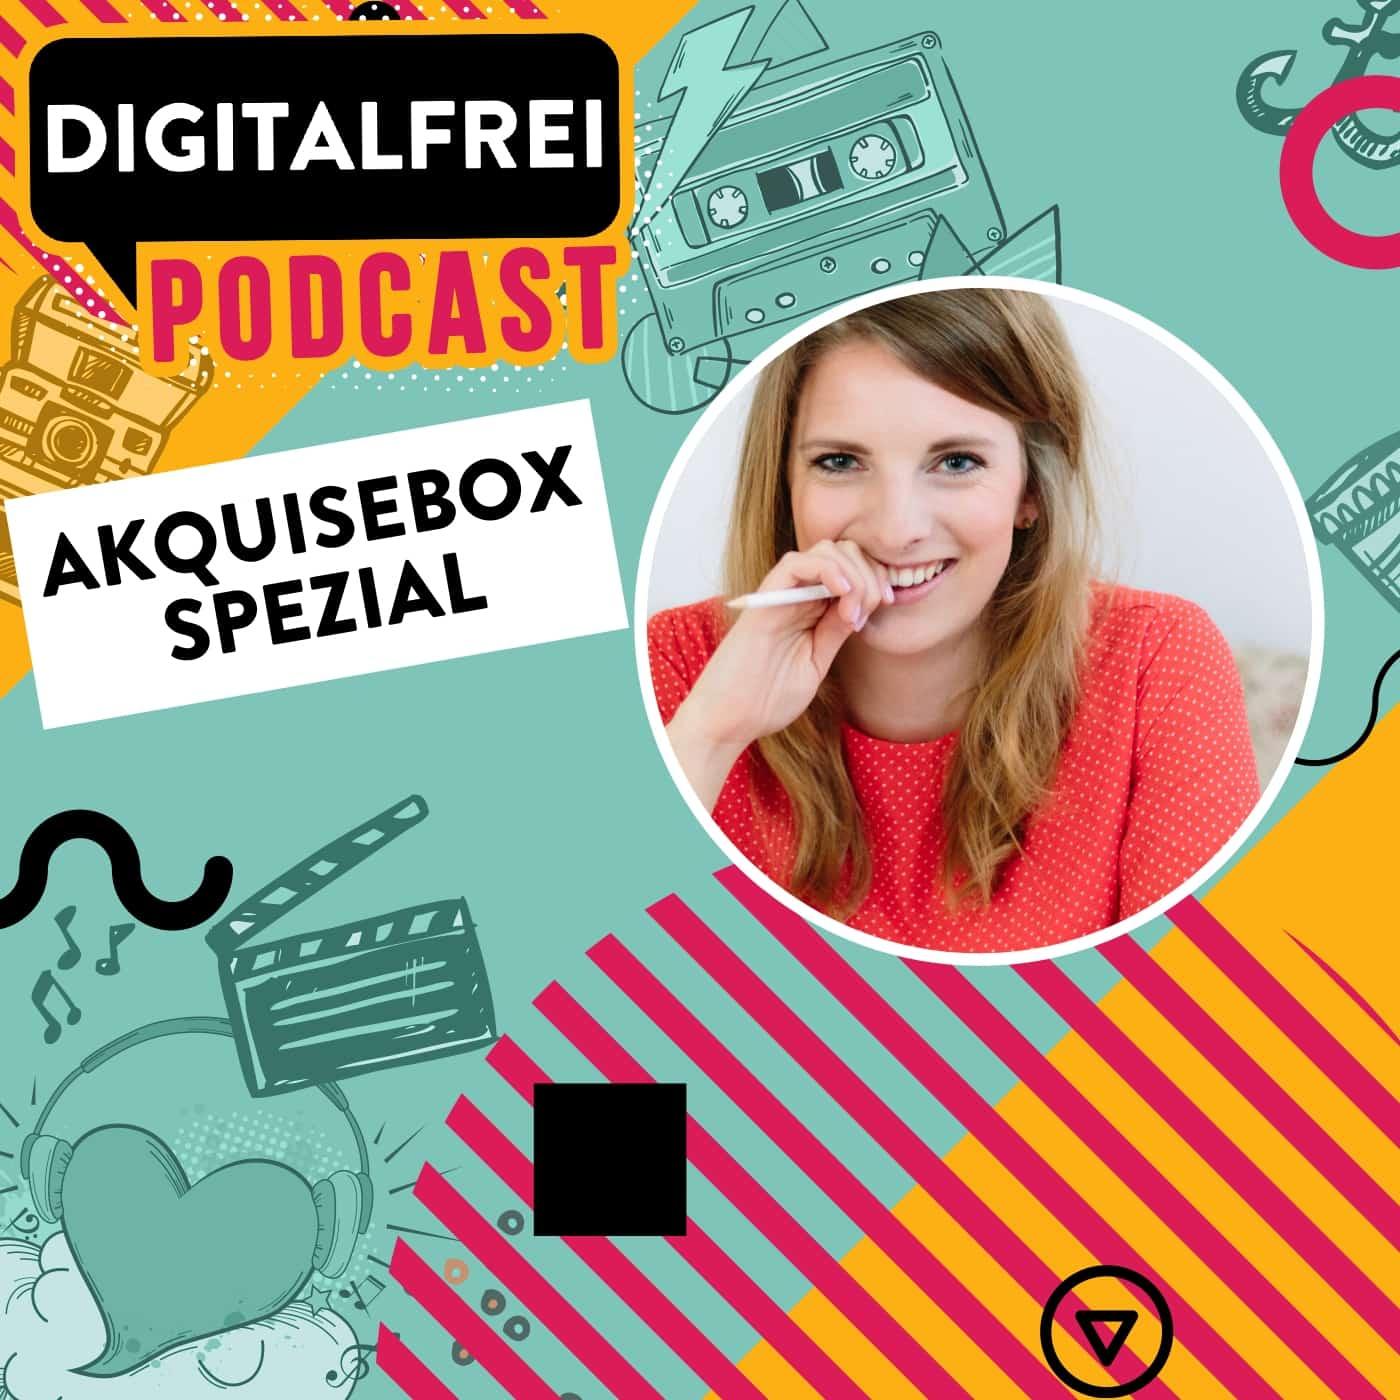 Akquisebox Spezial – Ann-Christin Schmitt-Rogalla – Texttrainerin